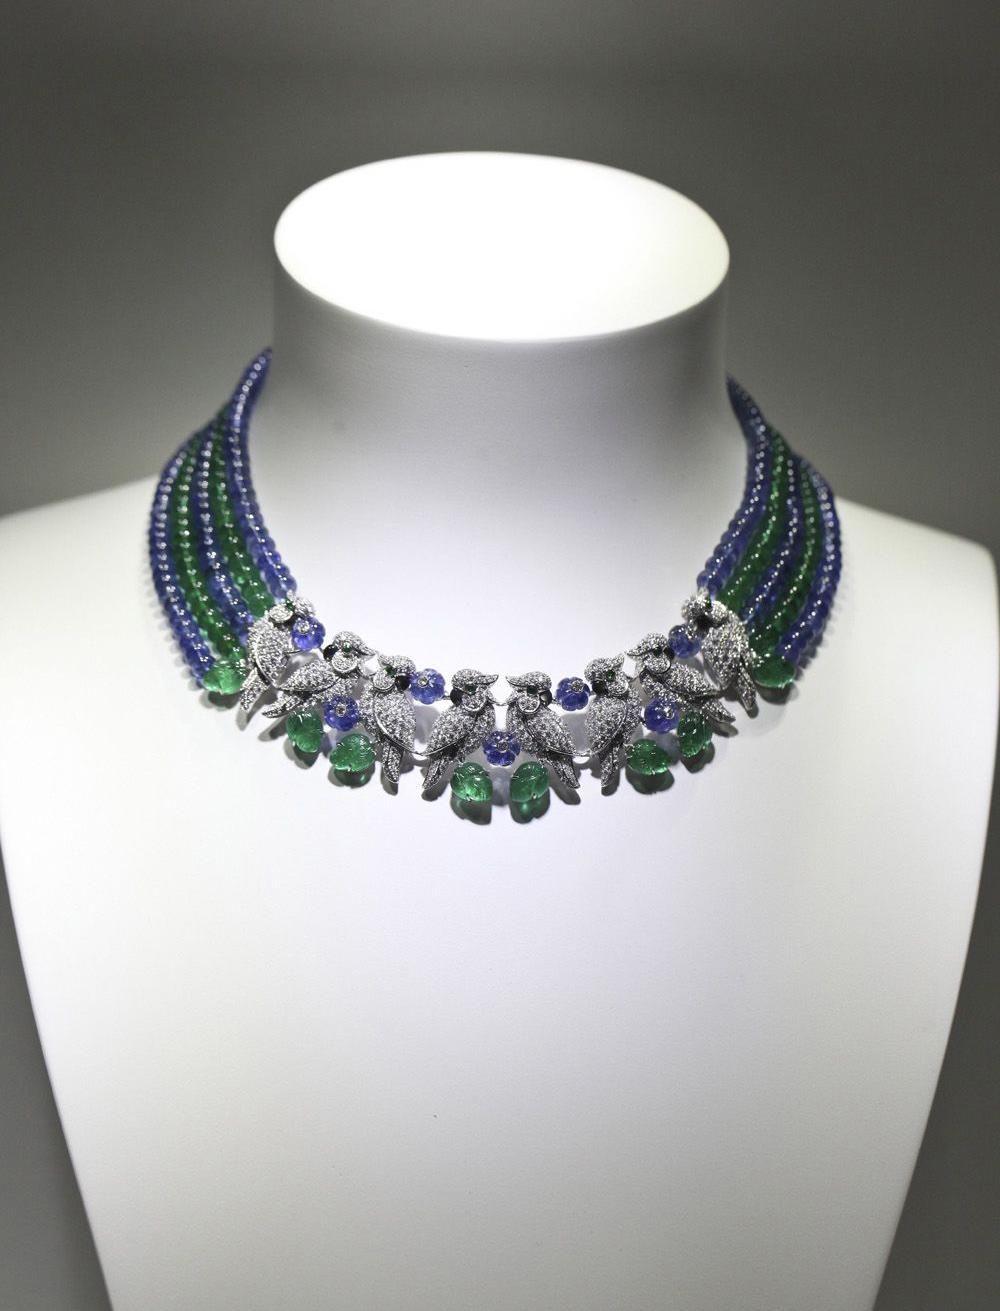 Cartier Jewelry | cartier jewelry necklace the brisk birds standing shoulder to shoulder